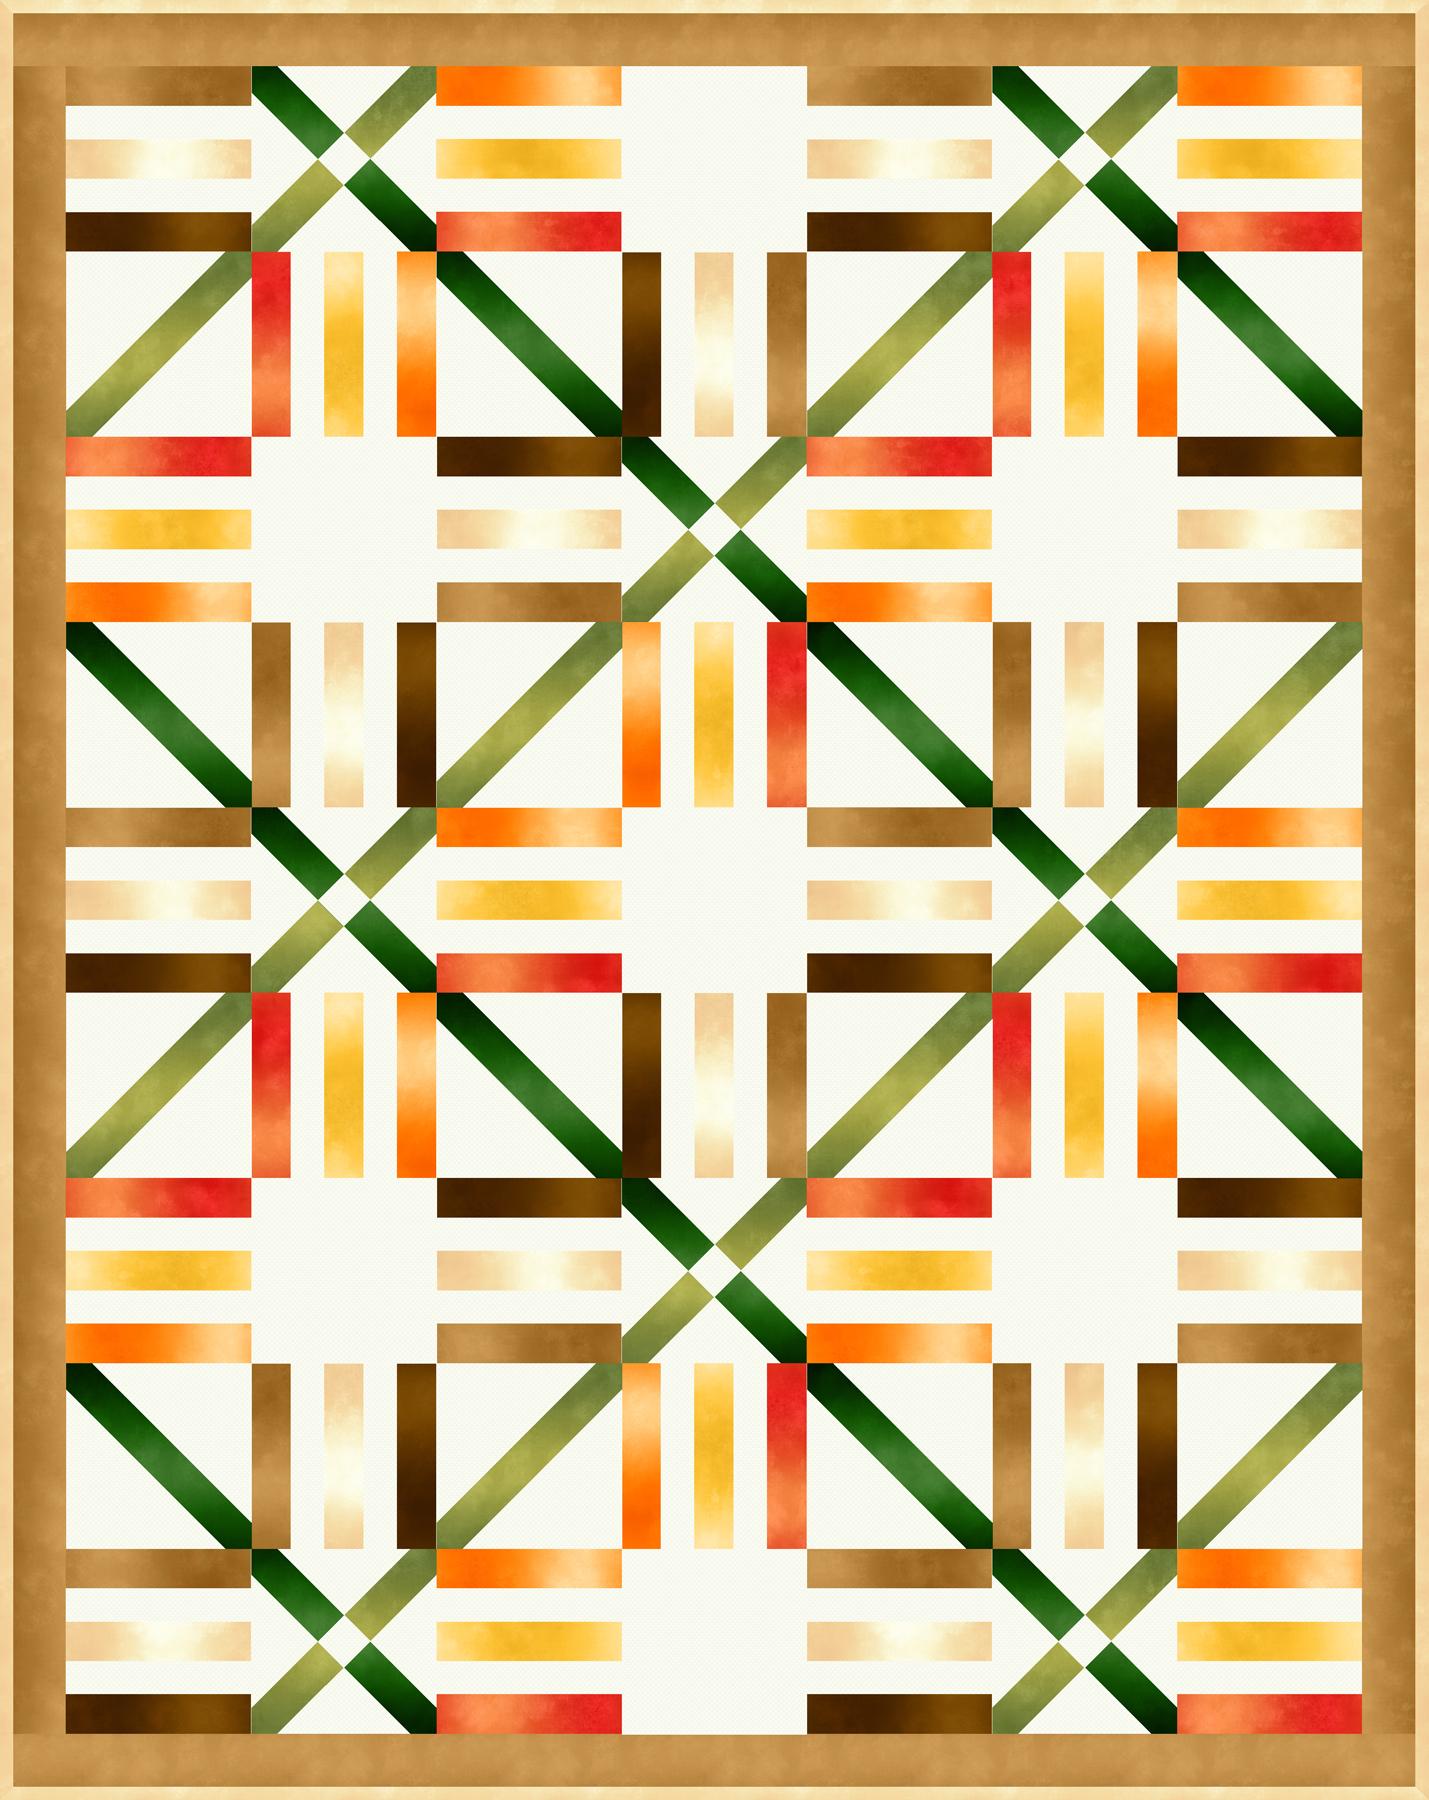 Ombre Parquet Pattern - Warm